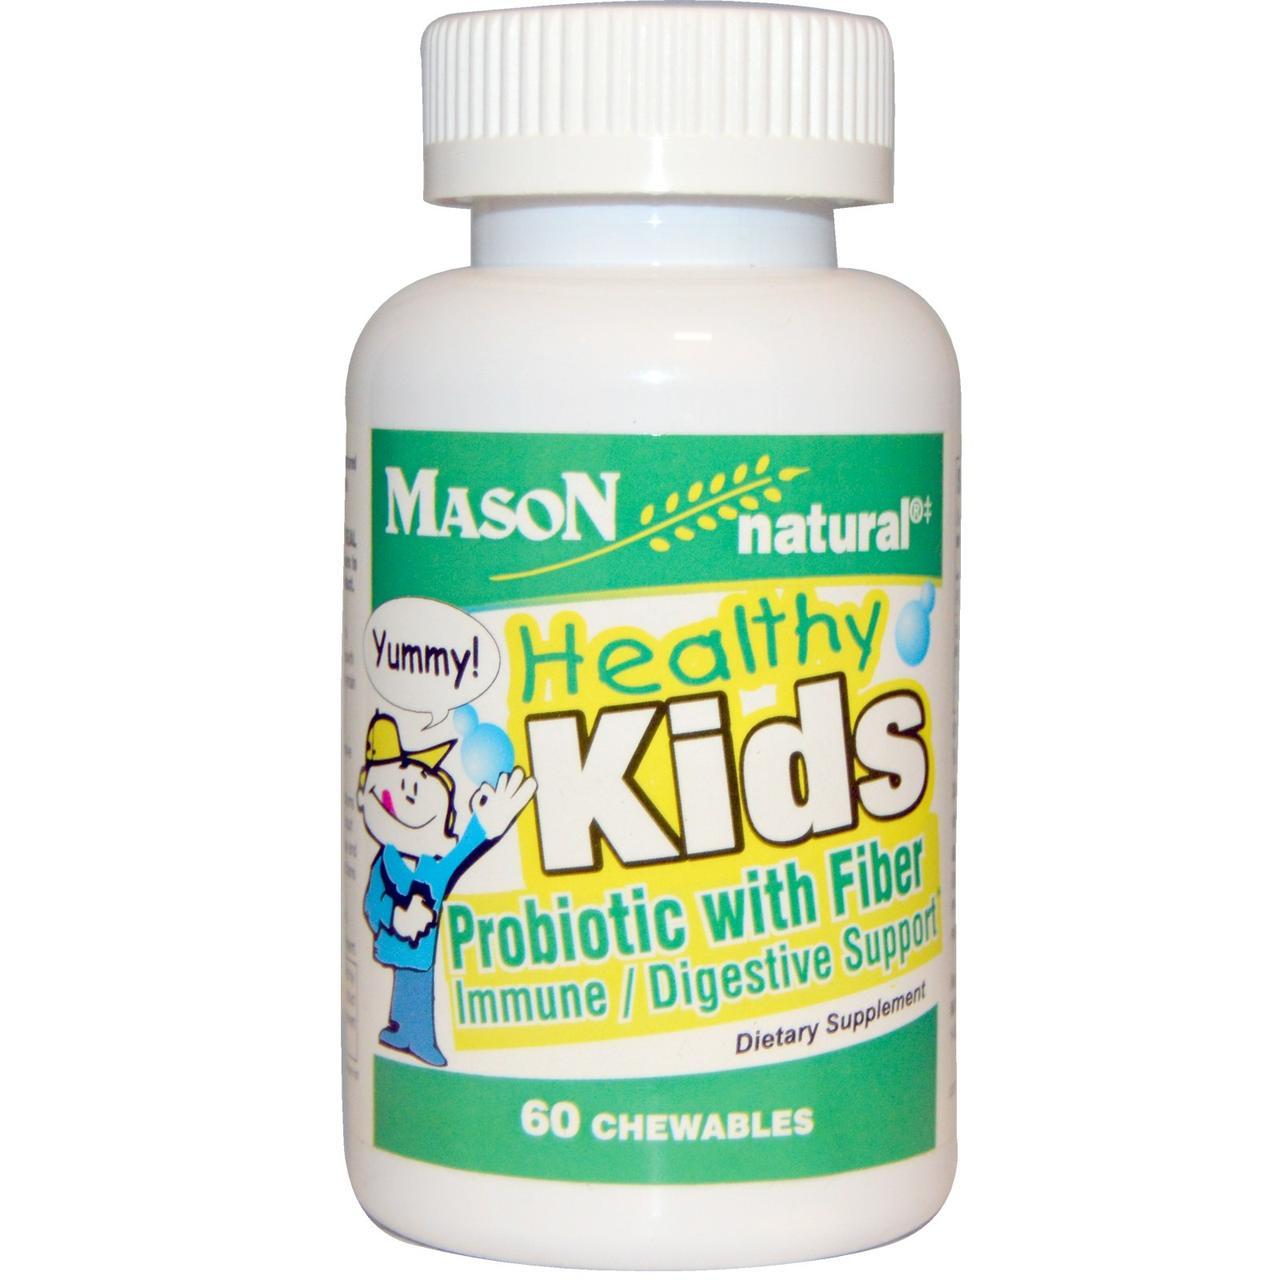 Mason Naturals, Healthy Kids Probiotic With Fiber детский пробиотик с клетчаткой, 60 шт